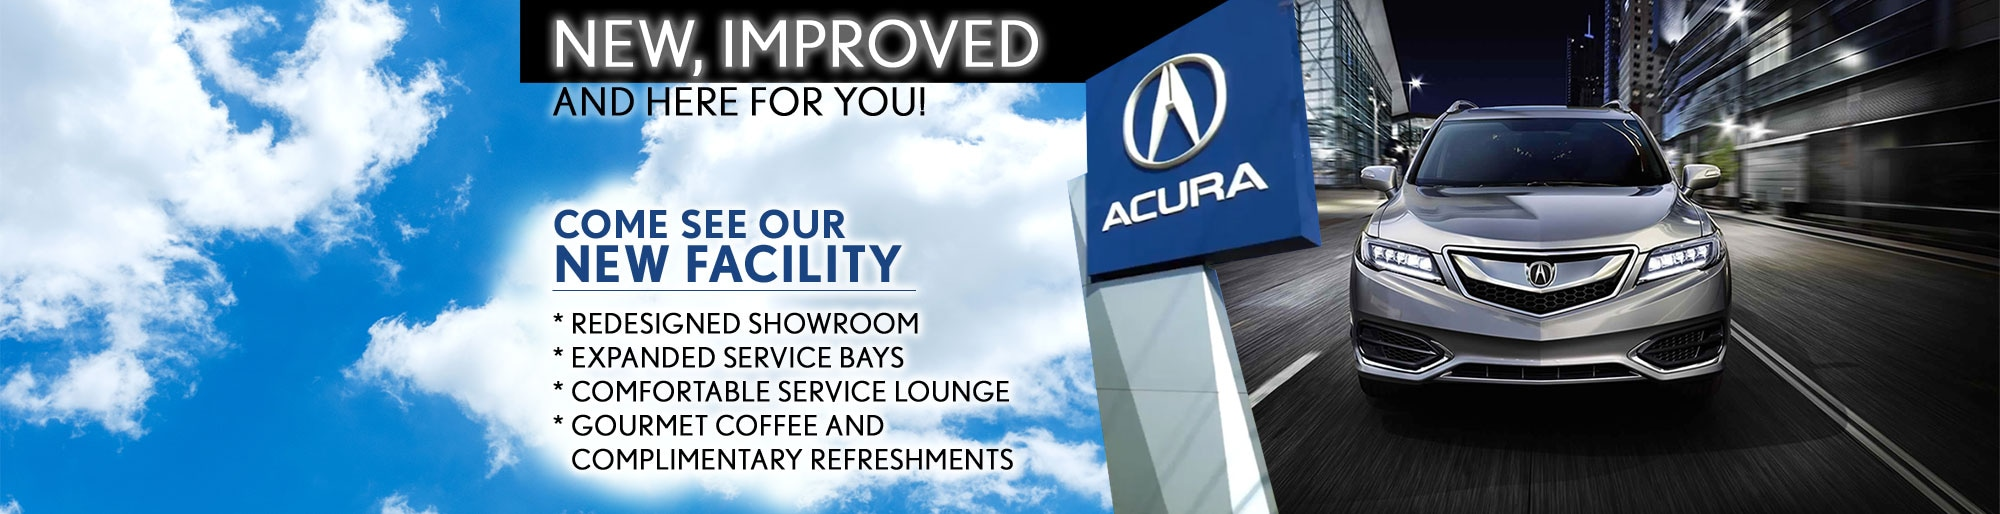 Acura Dealership Denver >> Hendrick Acura In Charlotte New 2019 2020 Used Acura Dealer